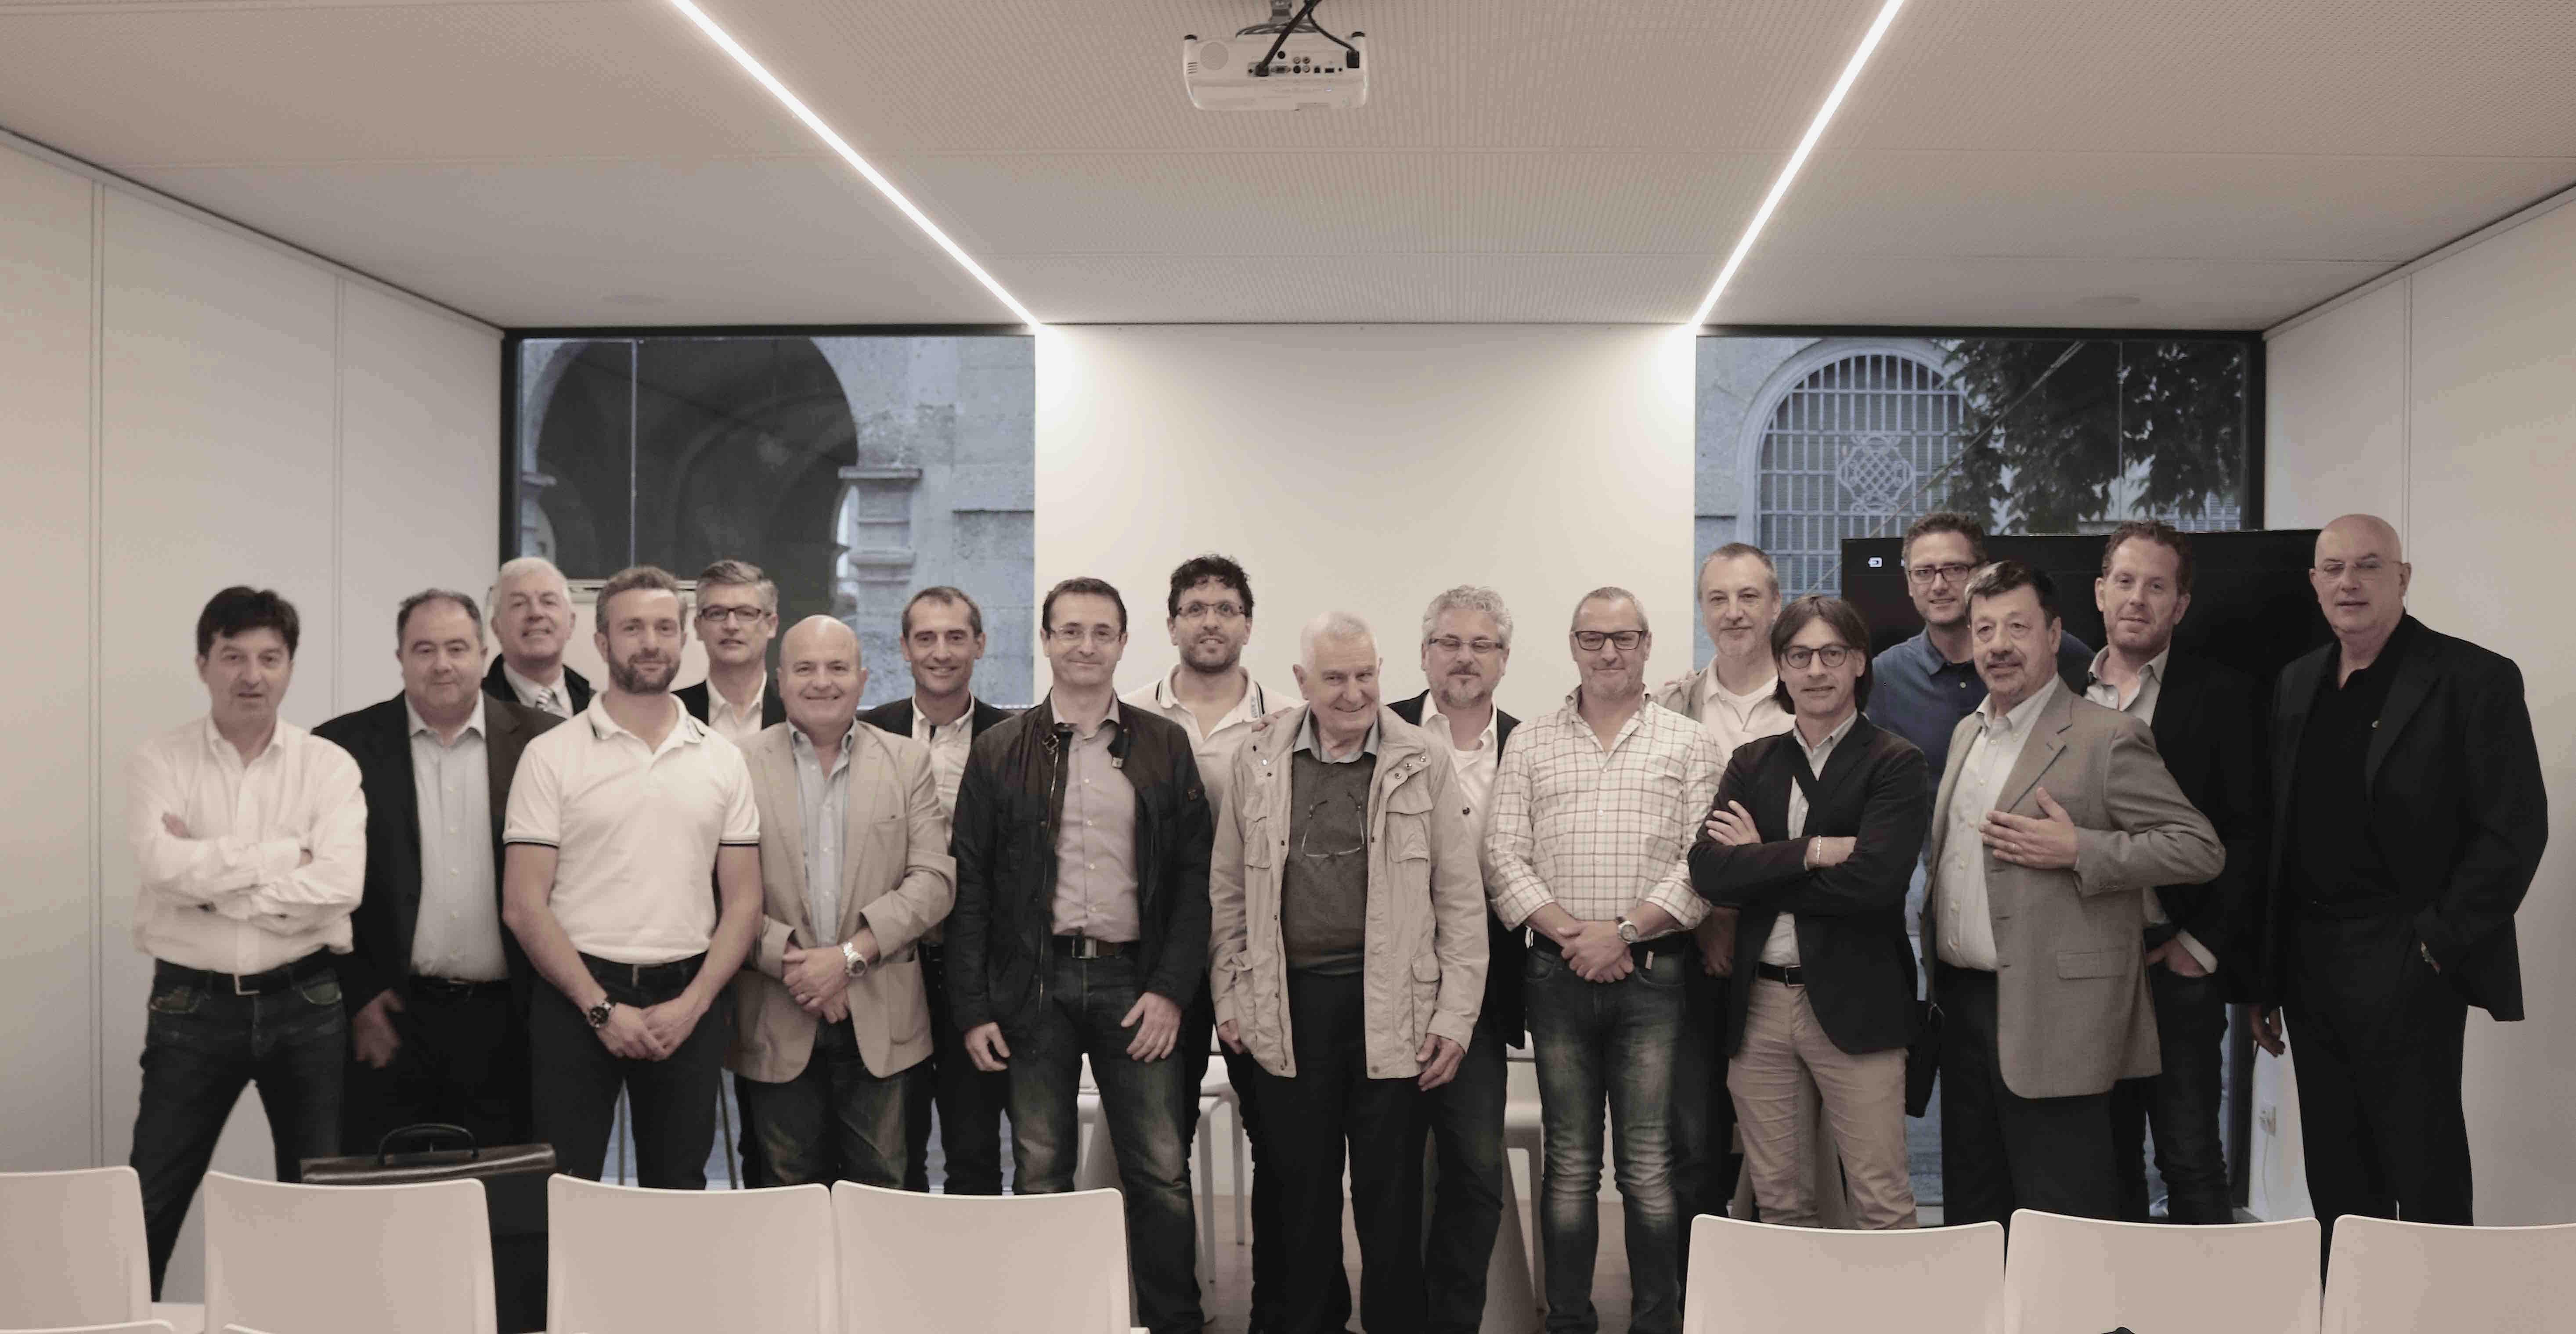 Team Vanoncini